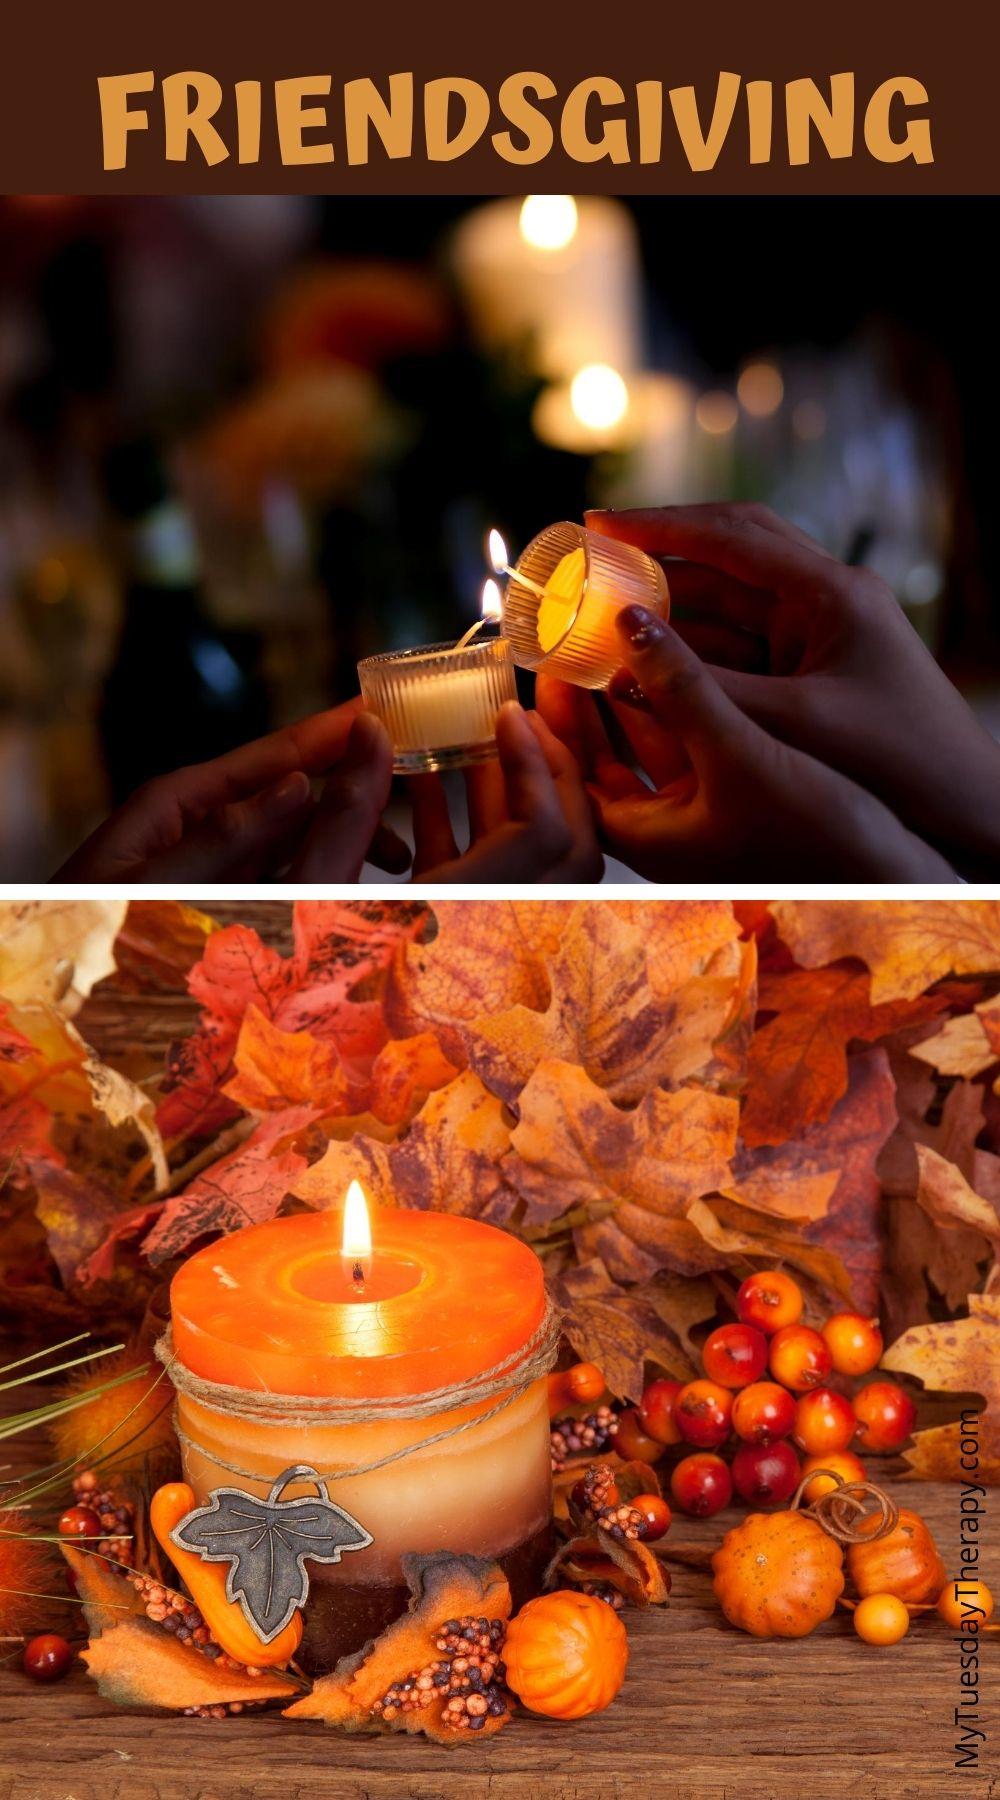 Friendsgiving decor ideas. Candles